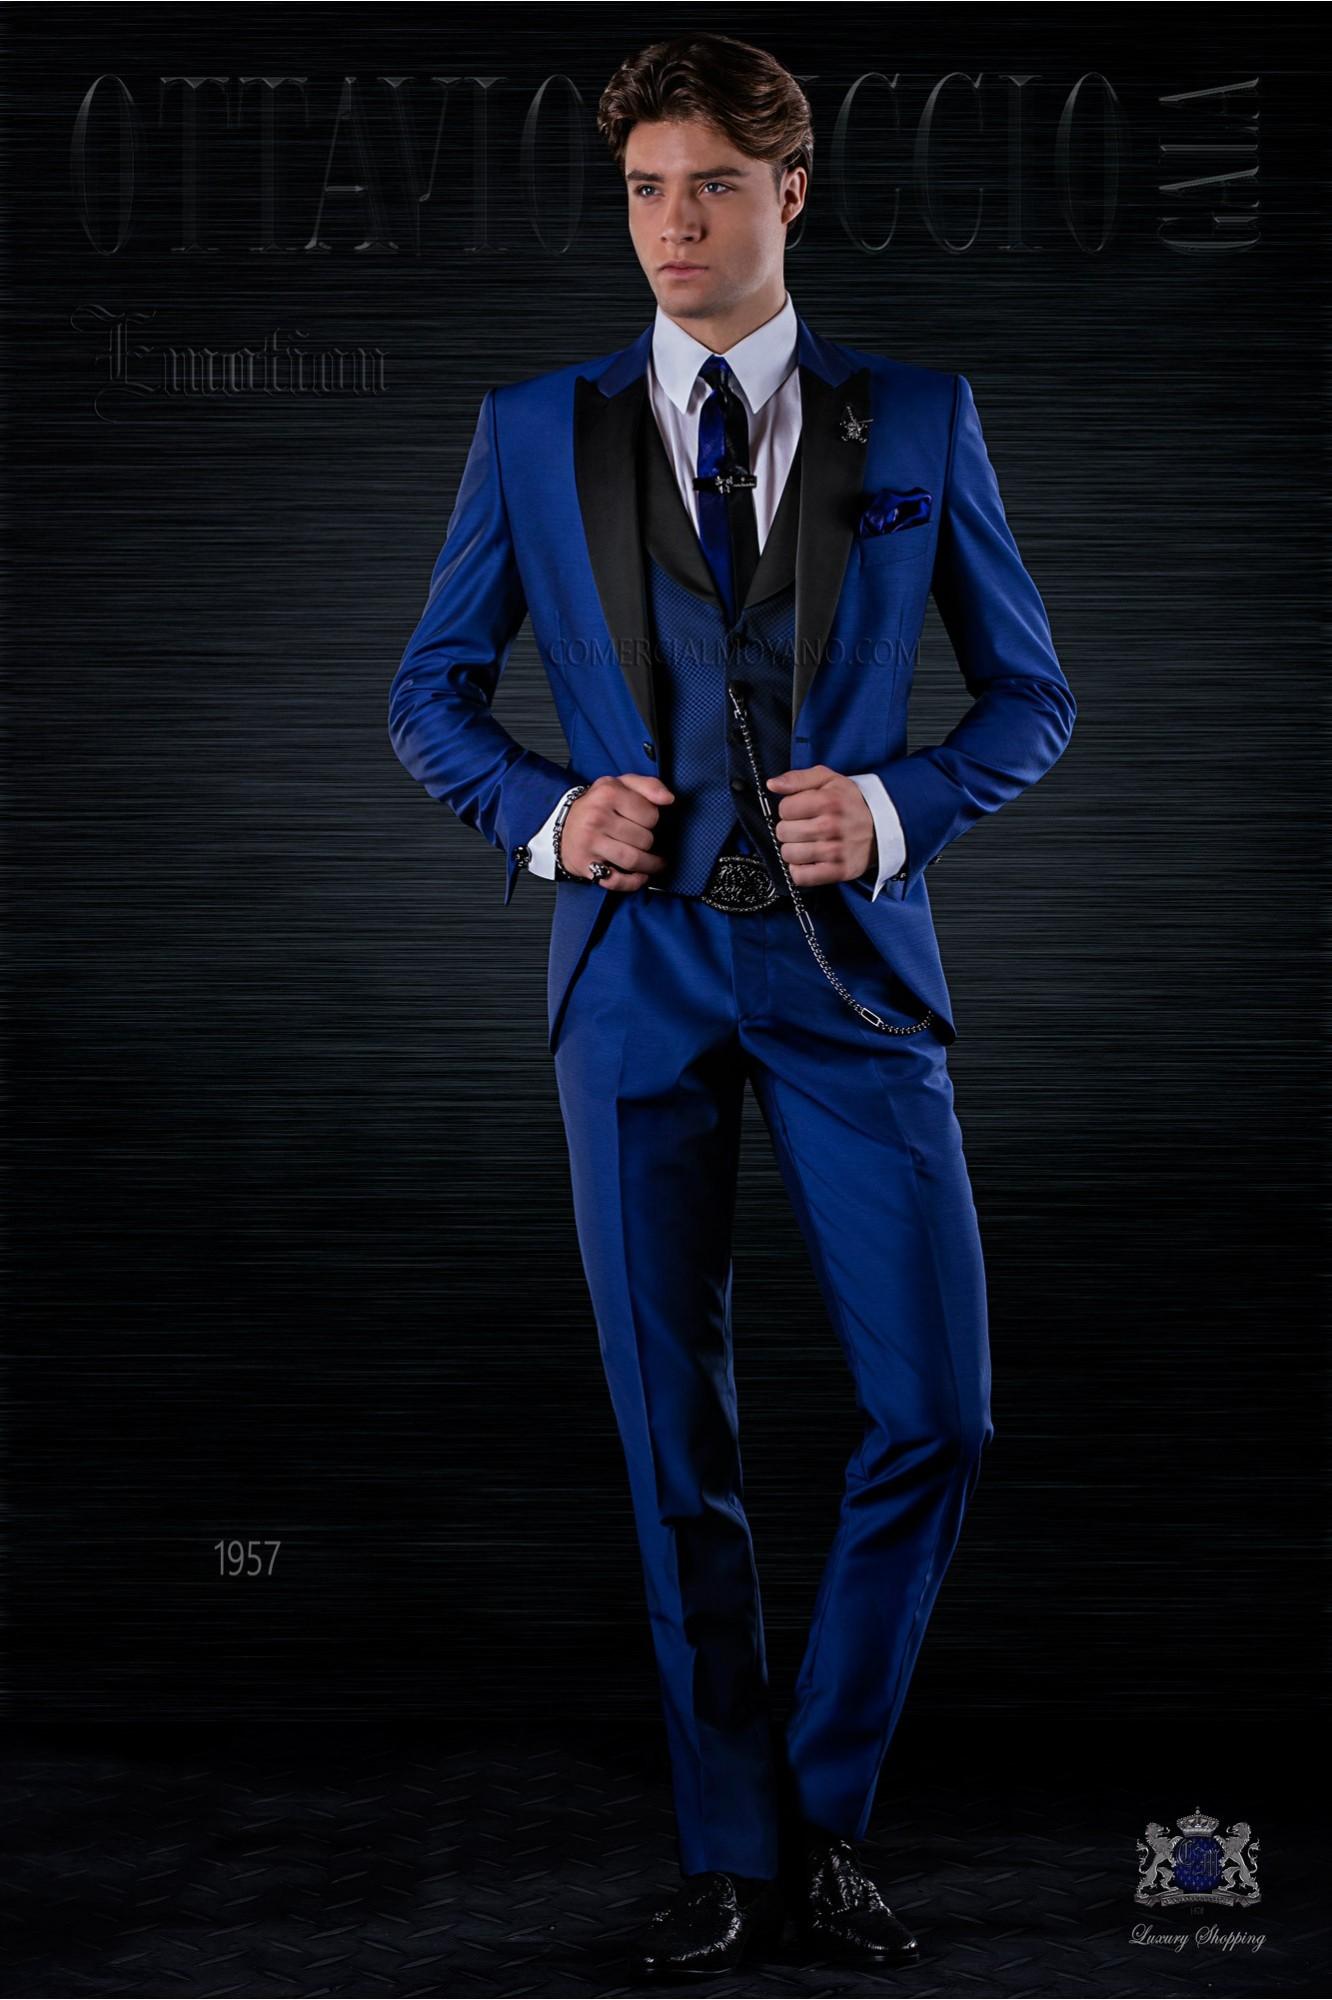 Traje de moda italiano a medida azul eléctrico